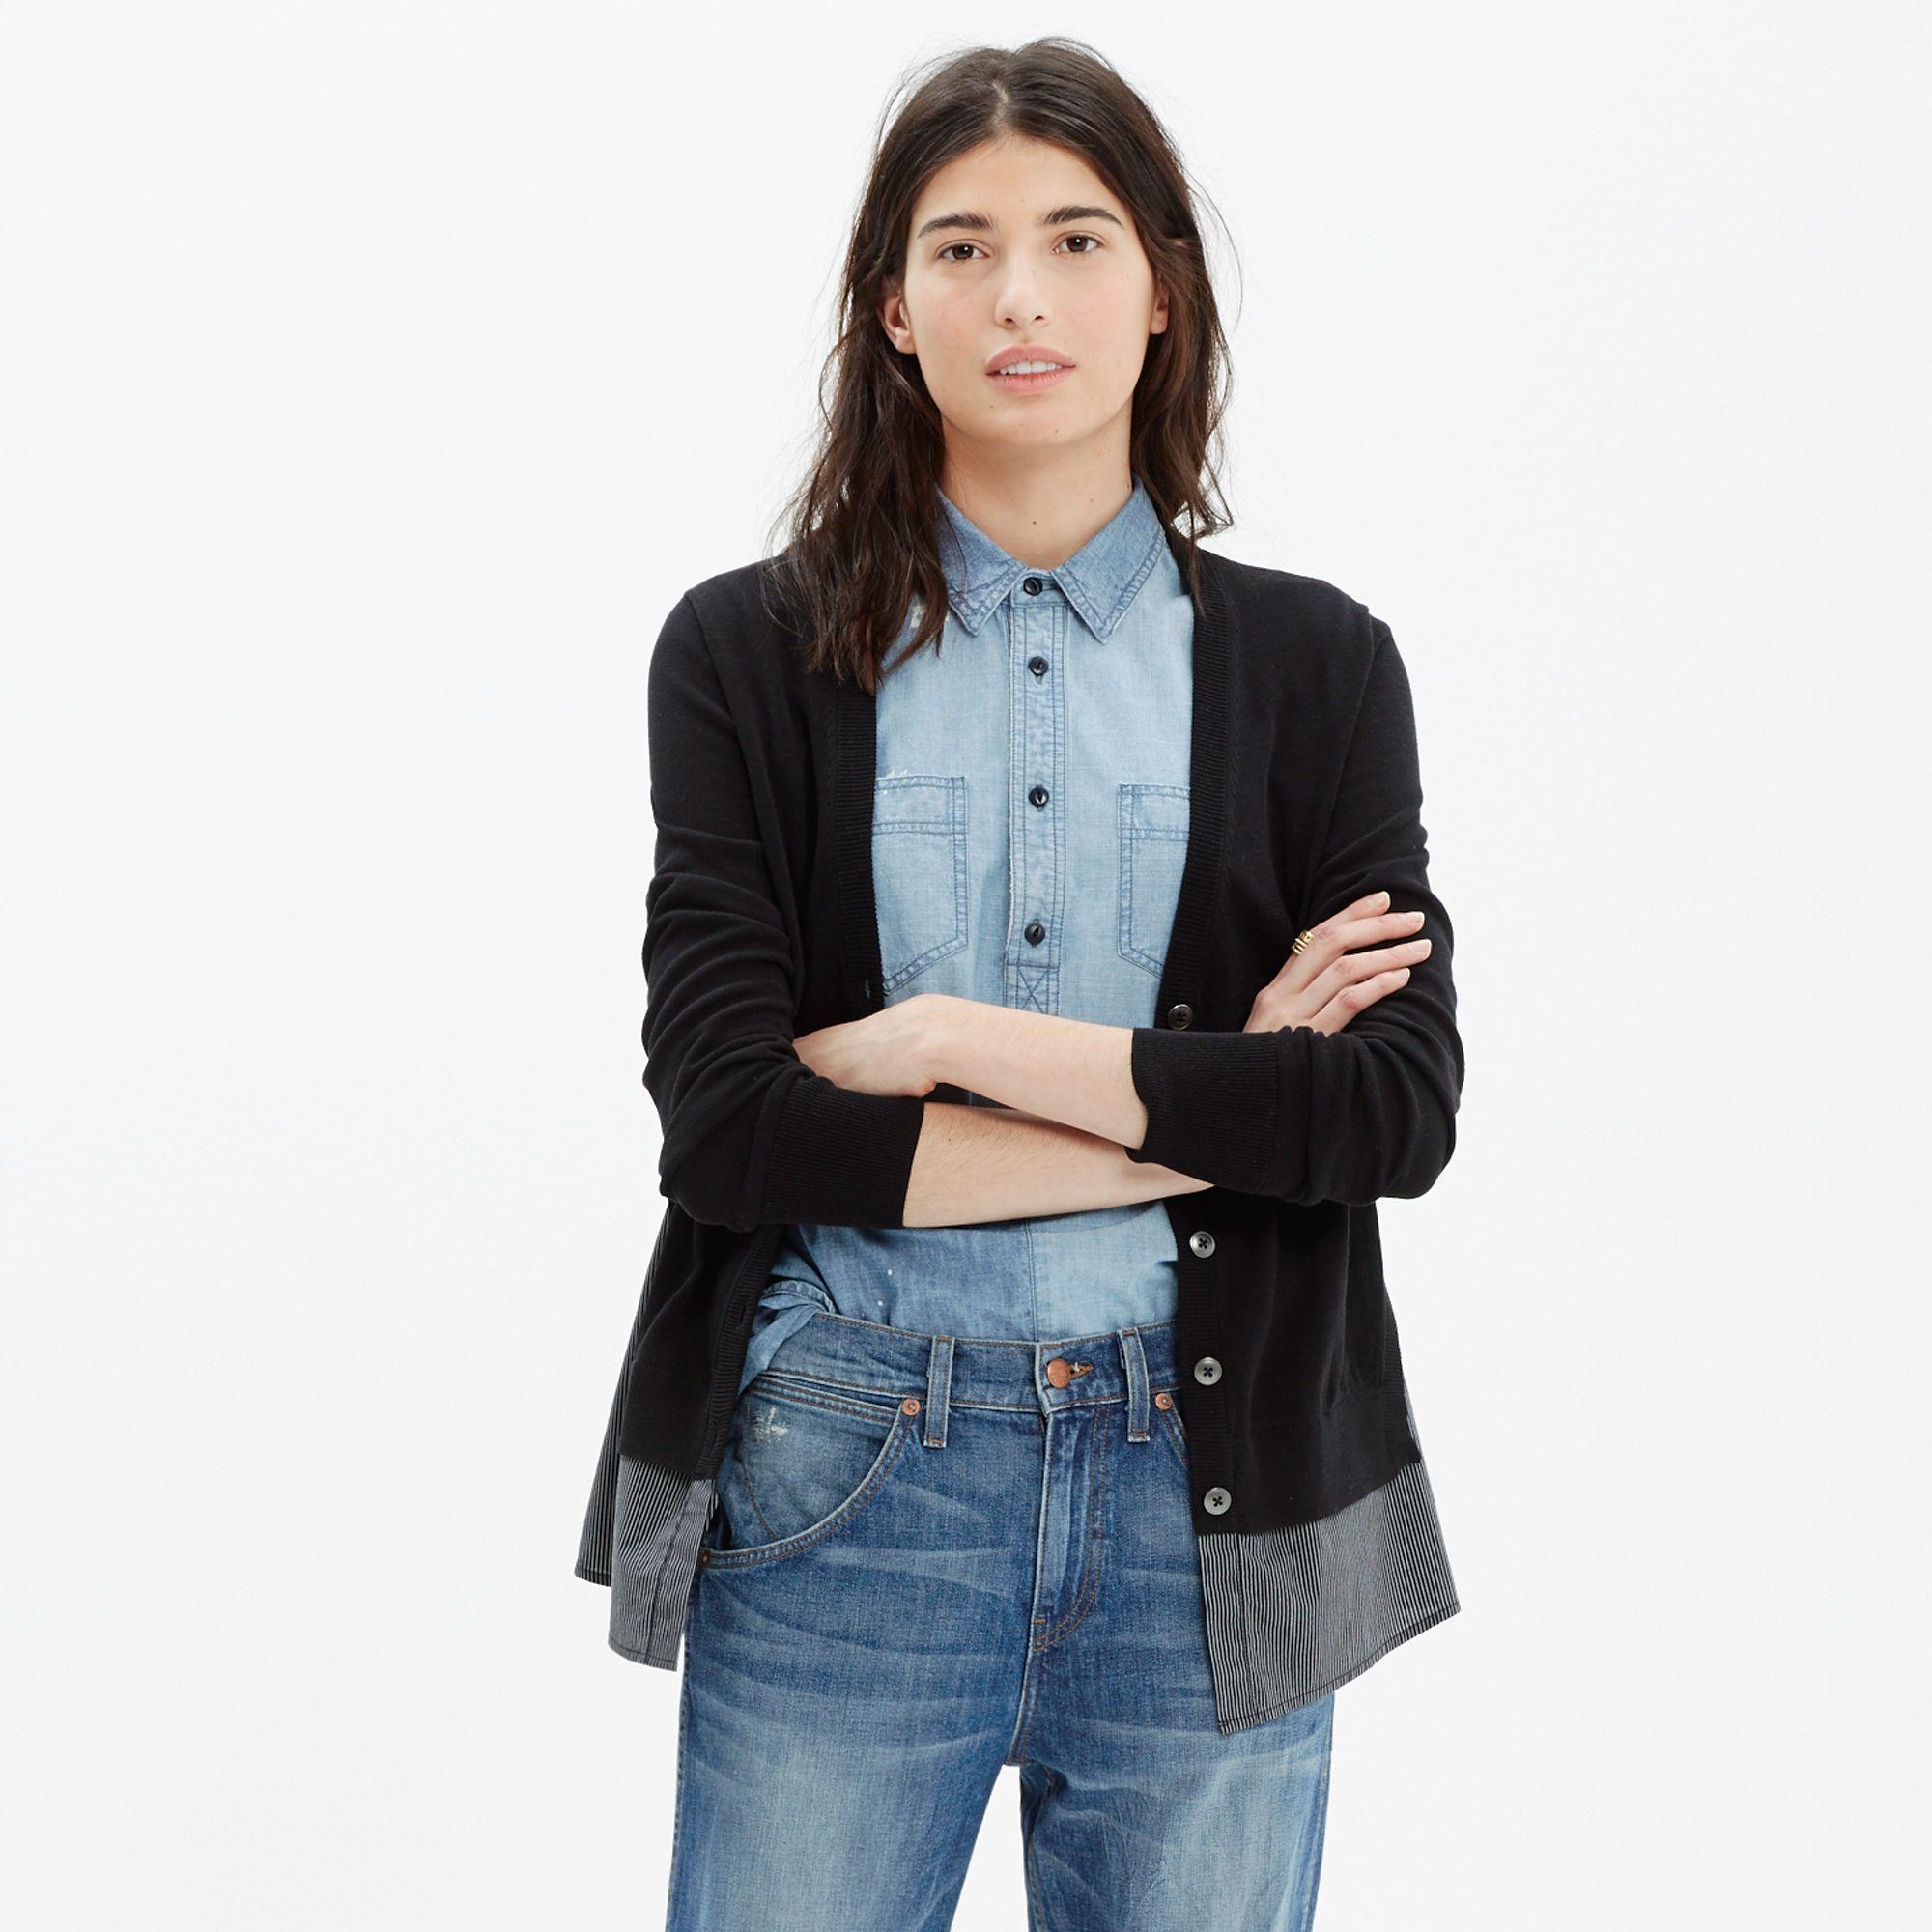 Madewell Shirting Cardigan Sweater in Black | Lyst